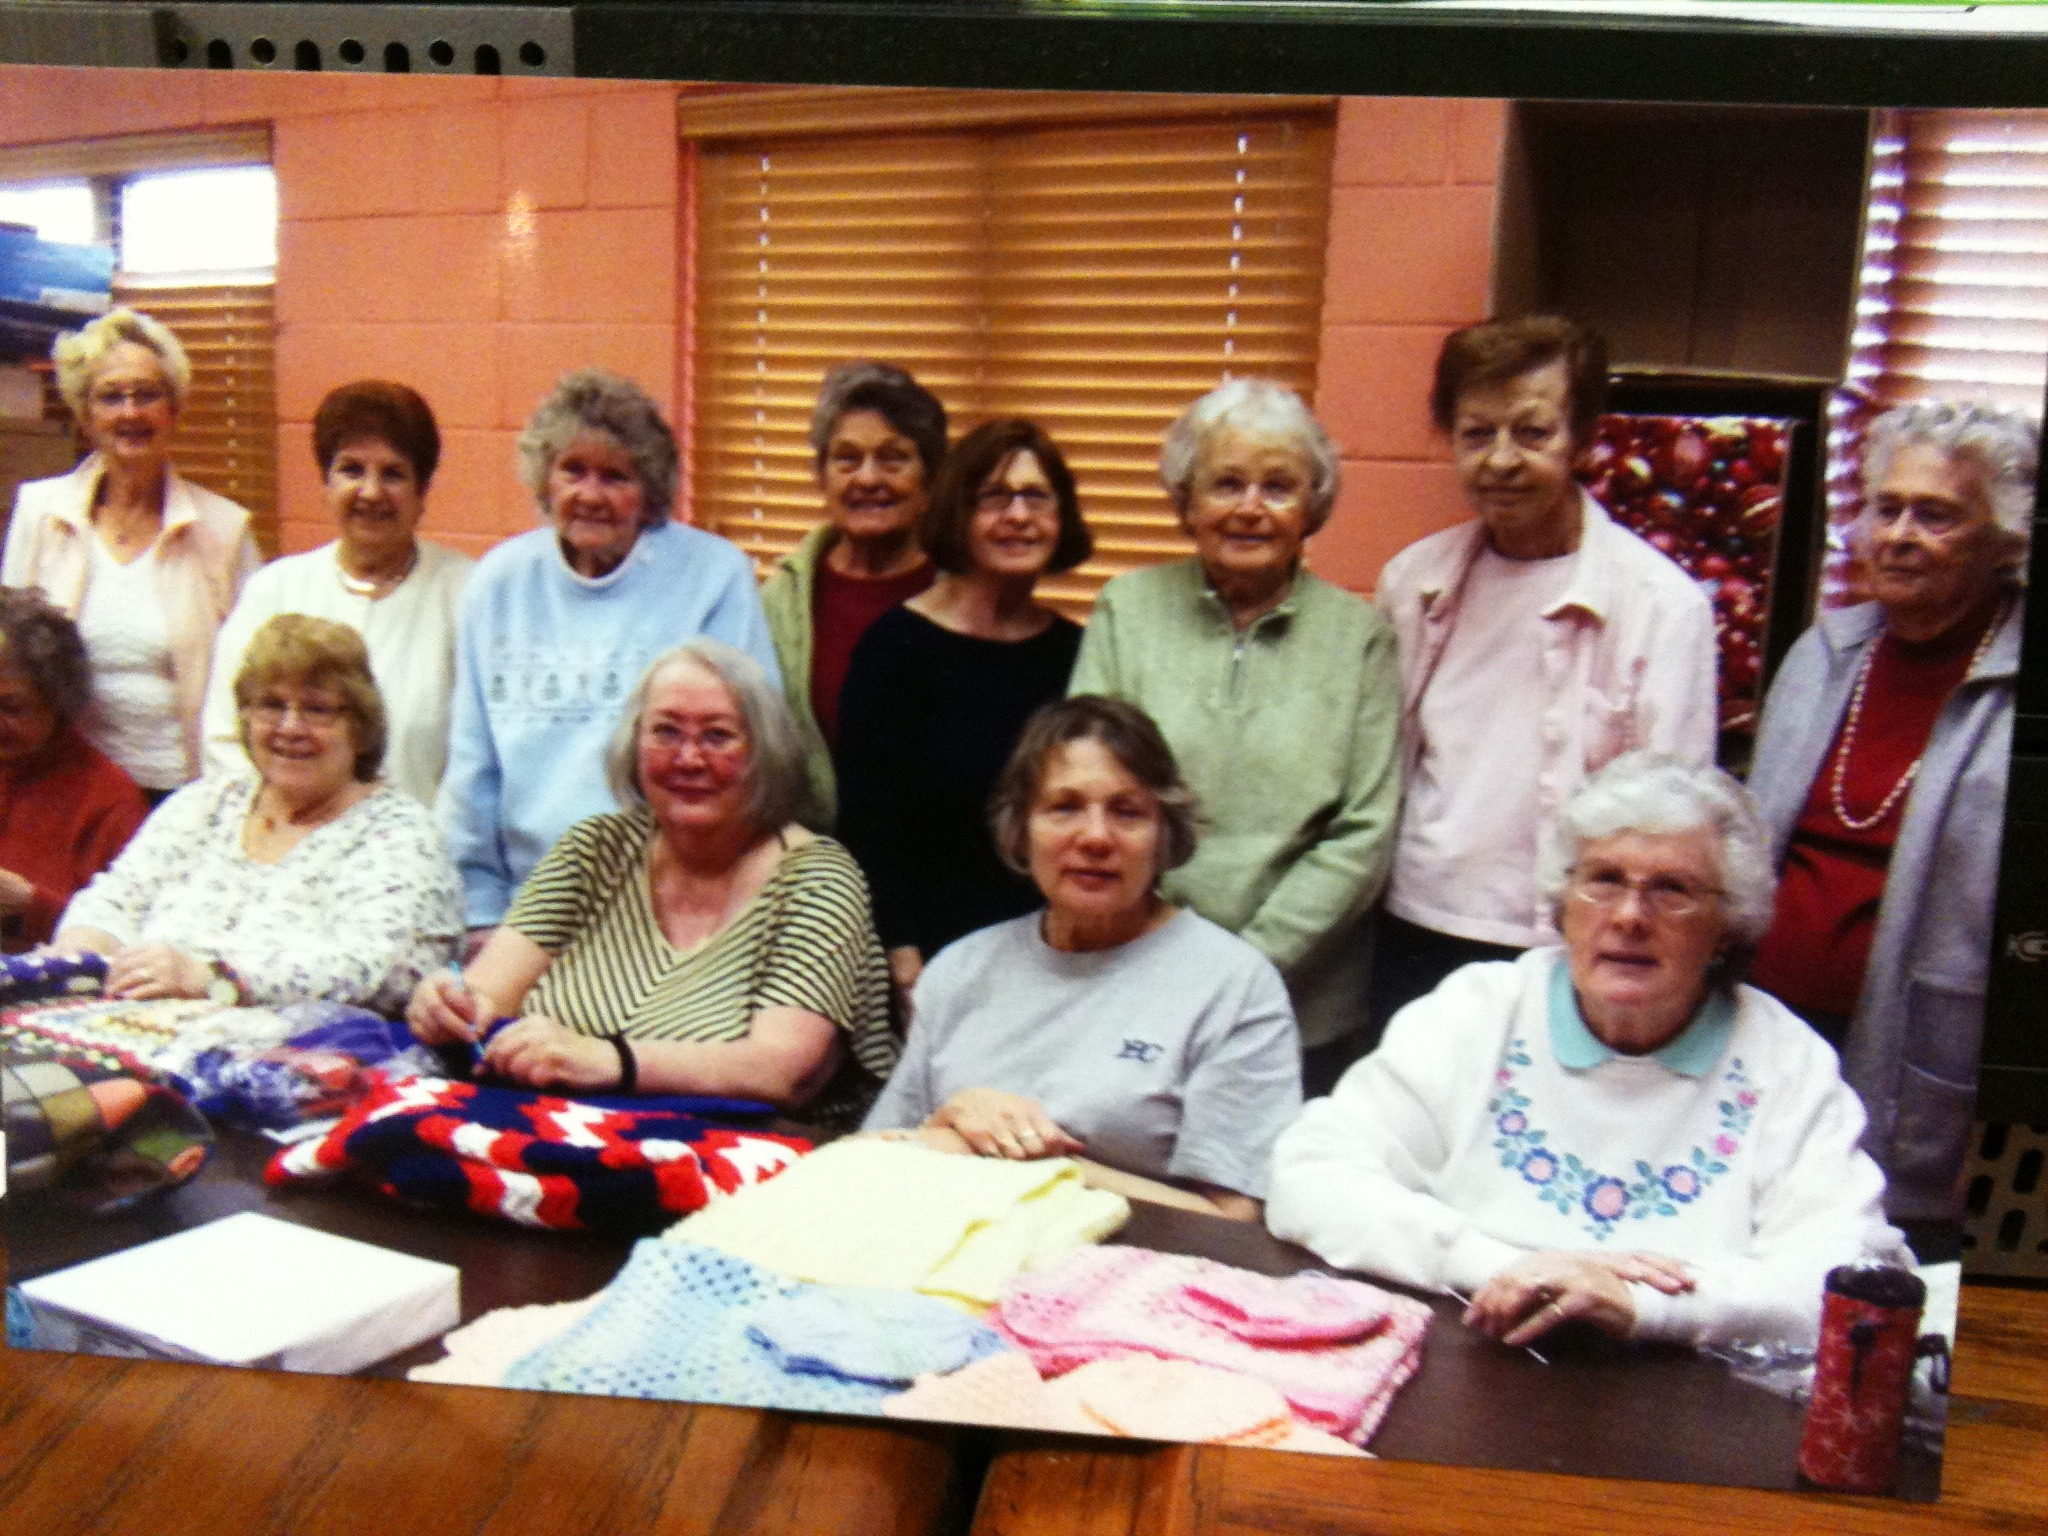 3bbafba7e5e3af59fa64_senior_knitting_group.jpg